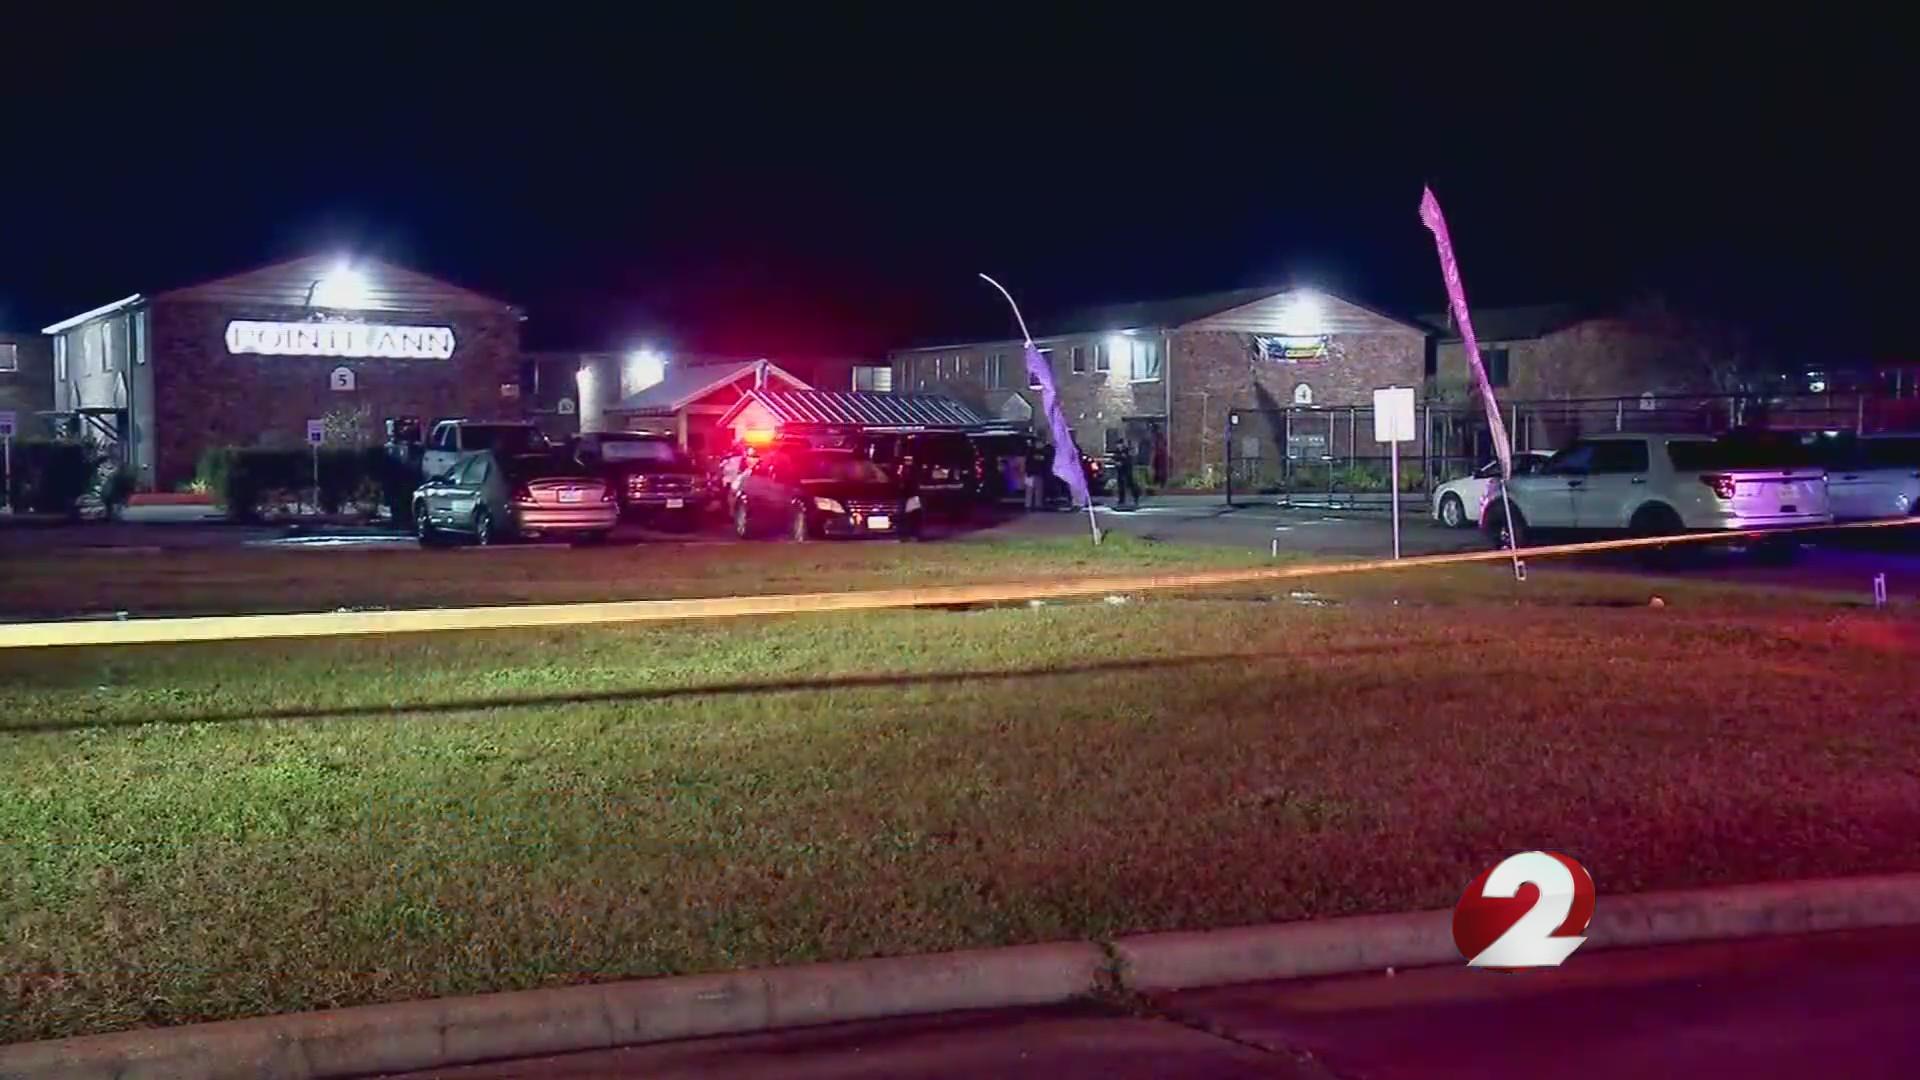 3 young children found dead in Texas apartment; man in custody